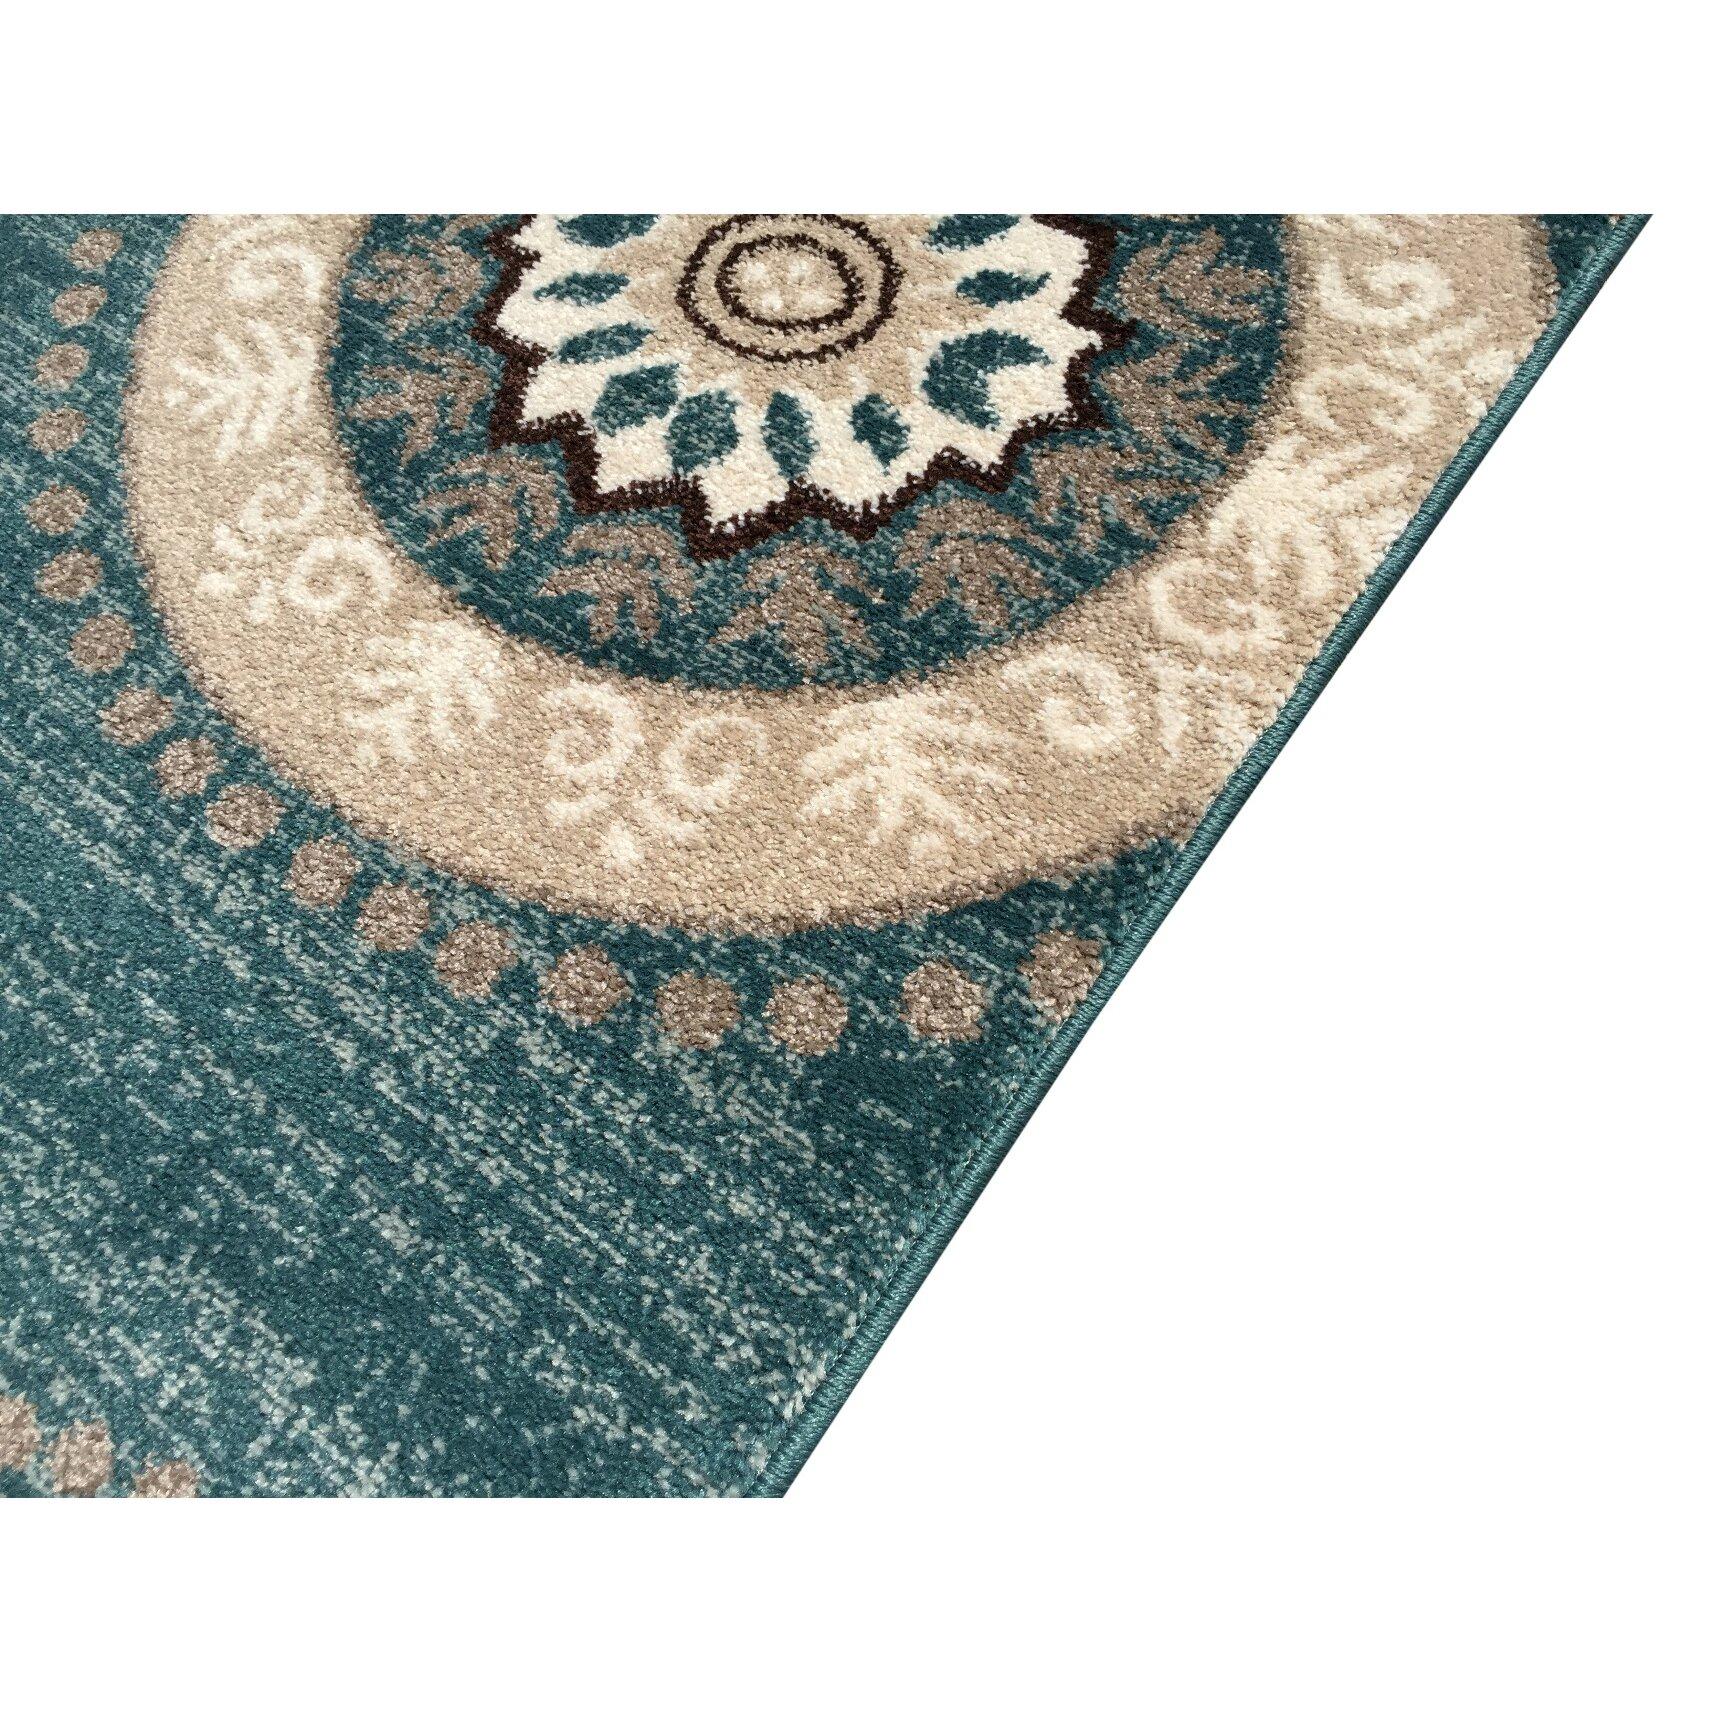 Teal Area Rug: Rugnur Zahra Teal Area Rug & Reviews